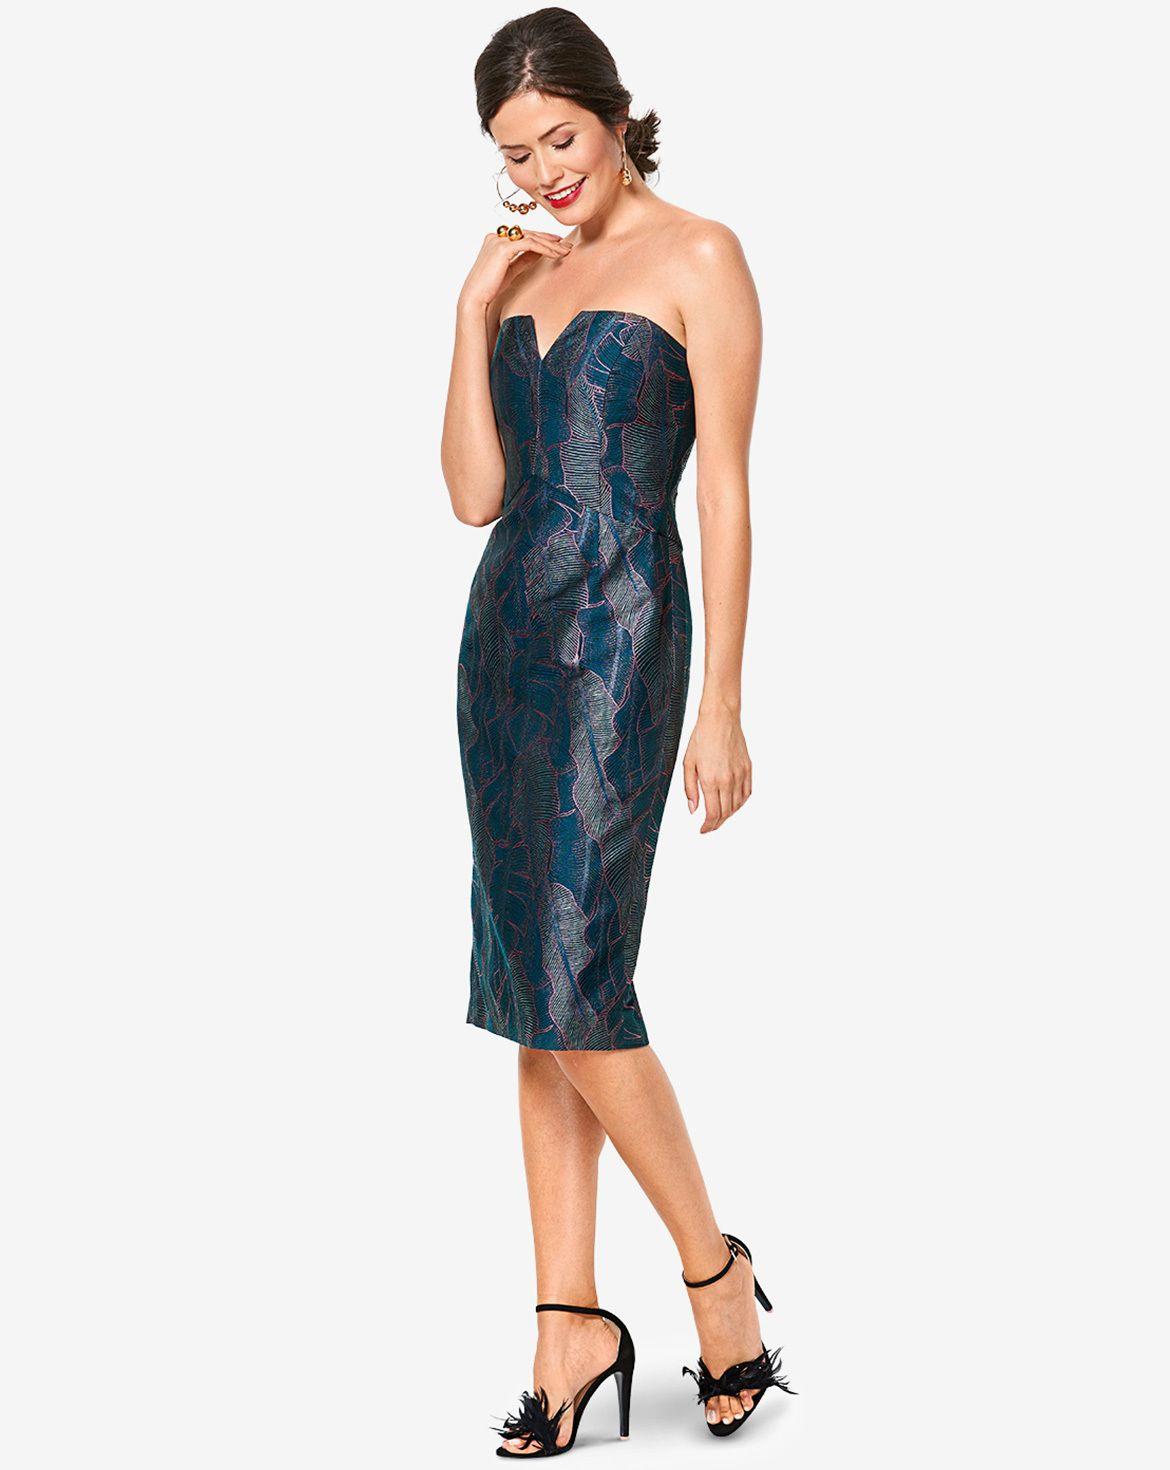 Formal Leicht Moderne Damenkleider Design17 Cool Moderne Damenkleider Ärmel